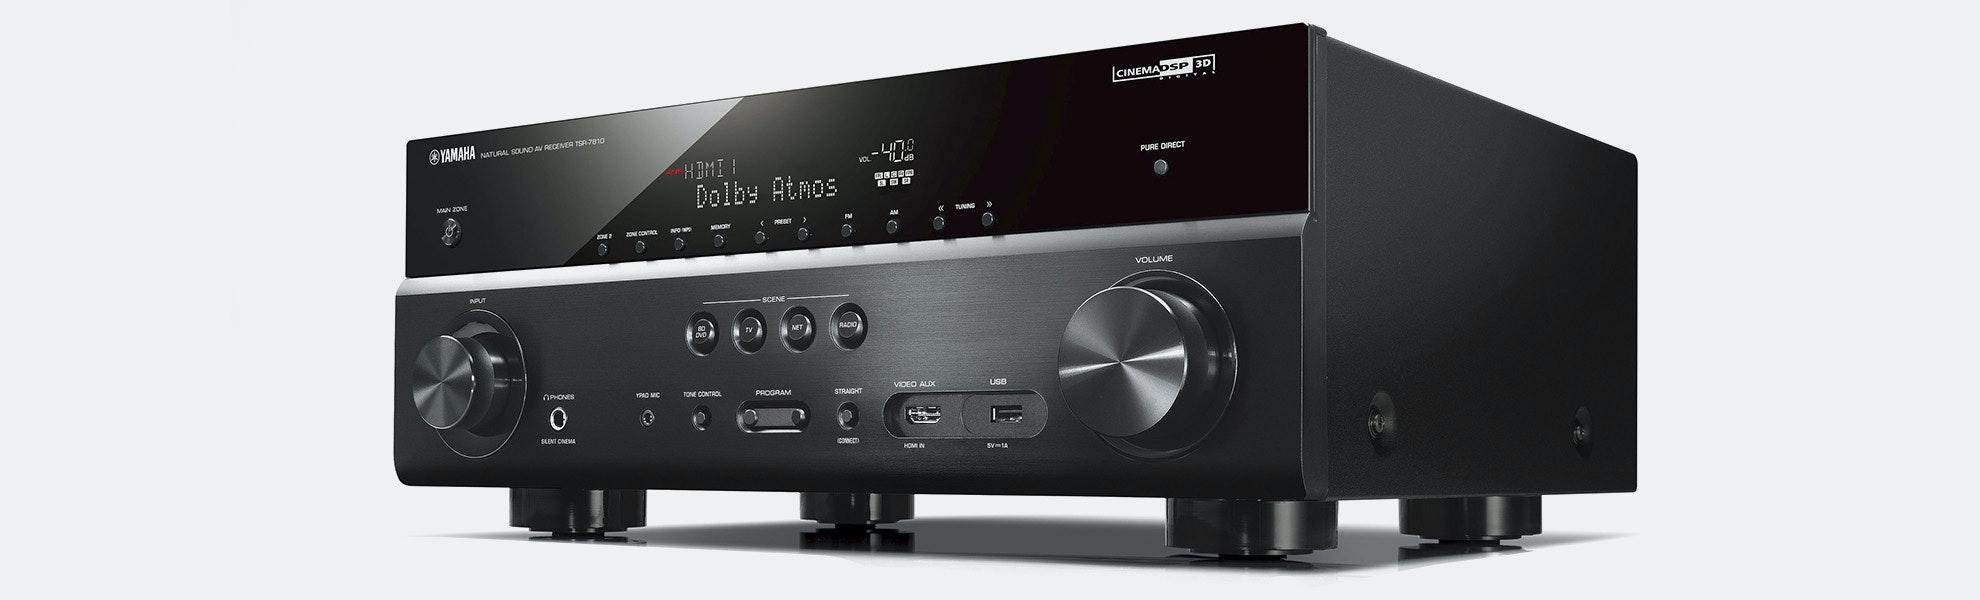 Yamaha 7.2ch 4K HDR Dolby Atmos Receiver (Refurb)